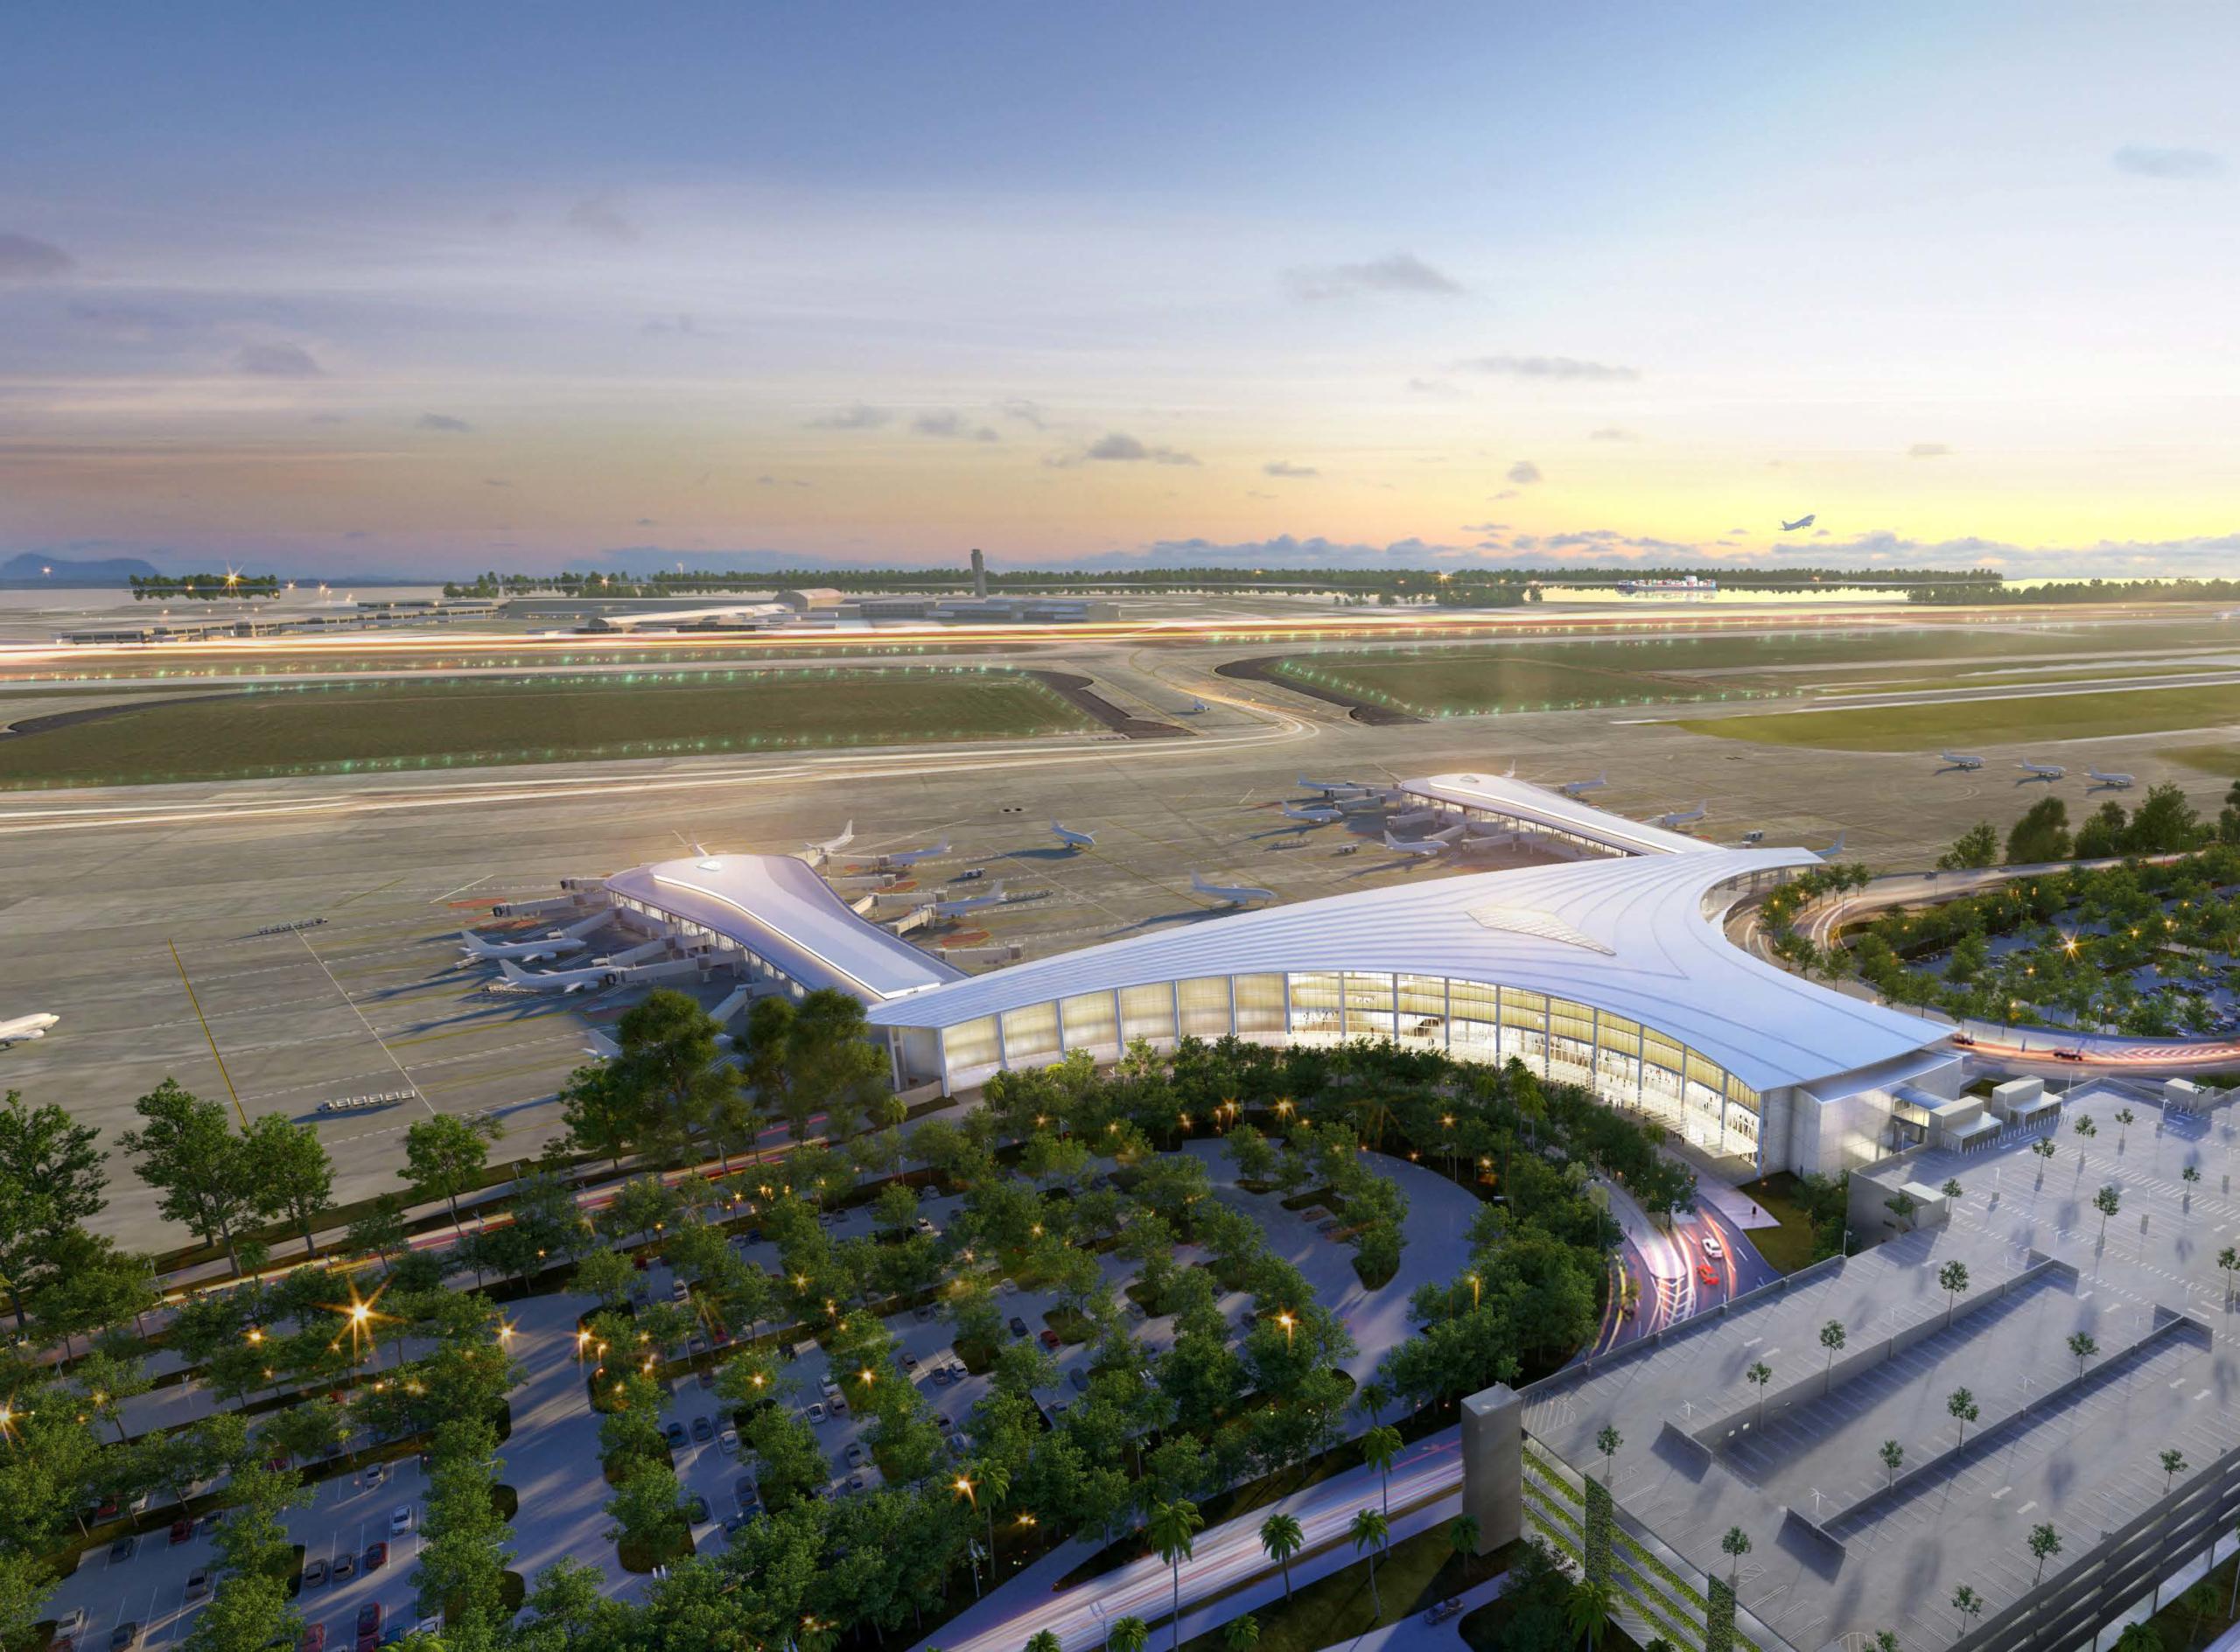 Eröffnung des Louis Armstrong New Orleans International Airport - inar.de